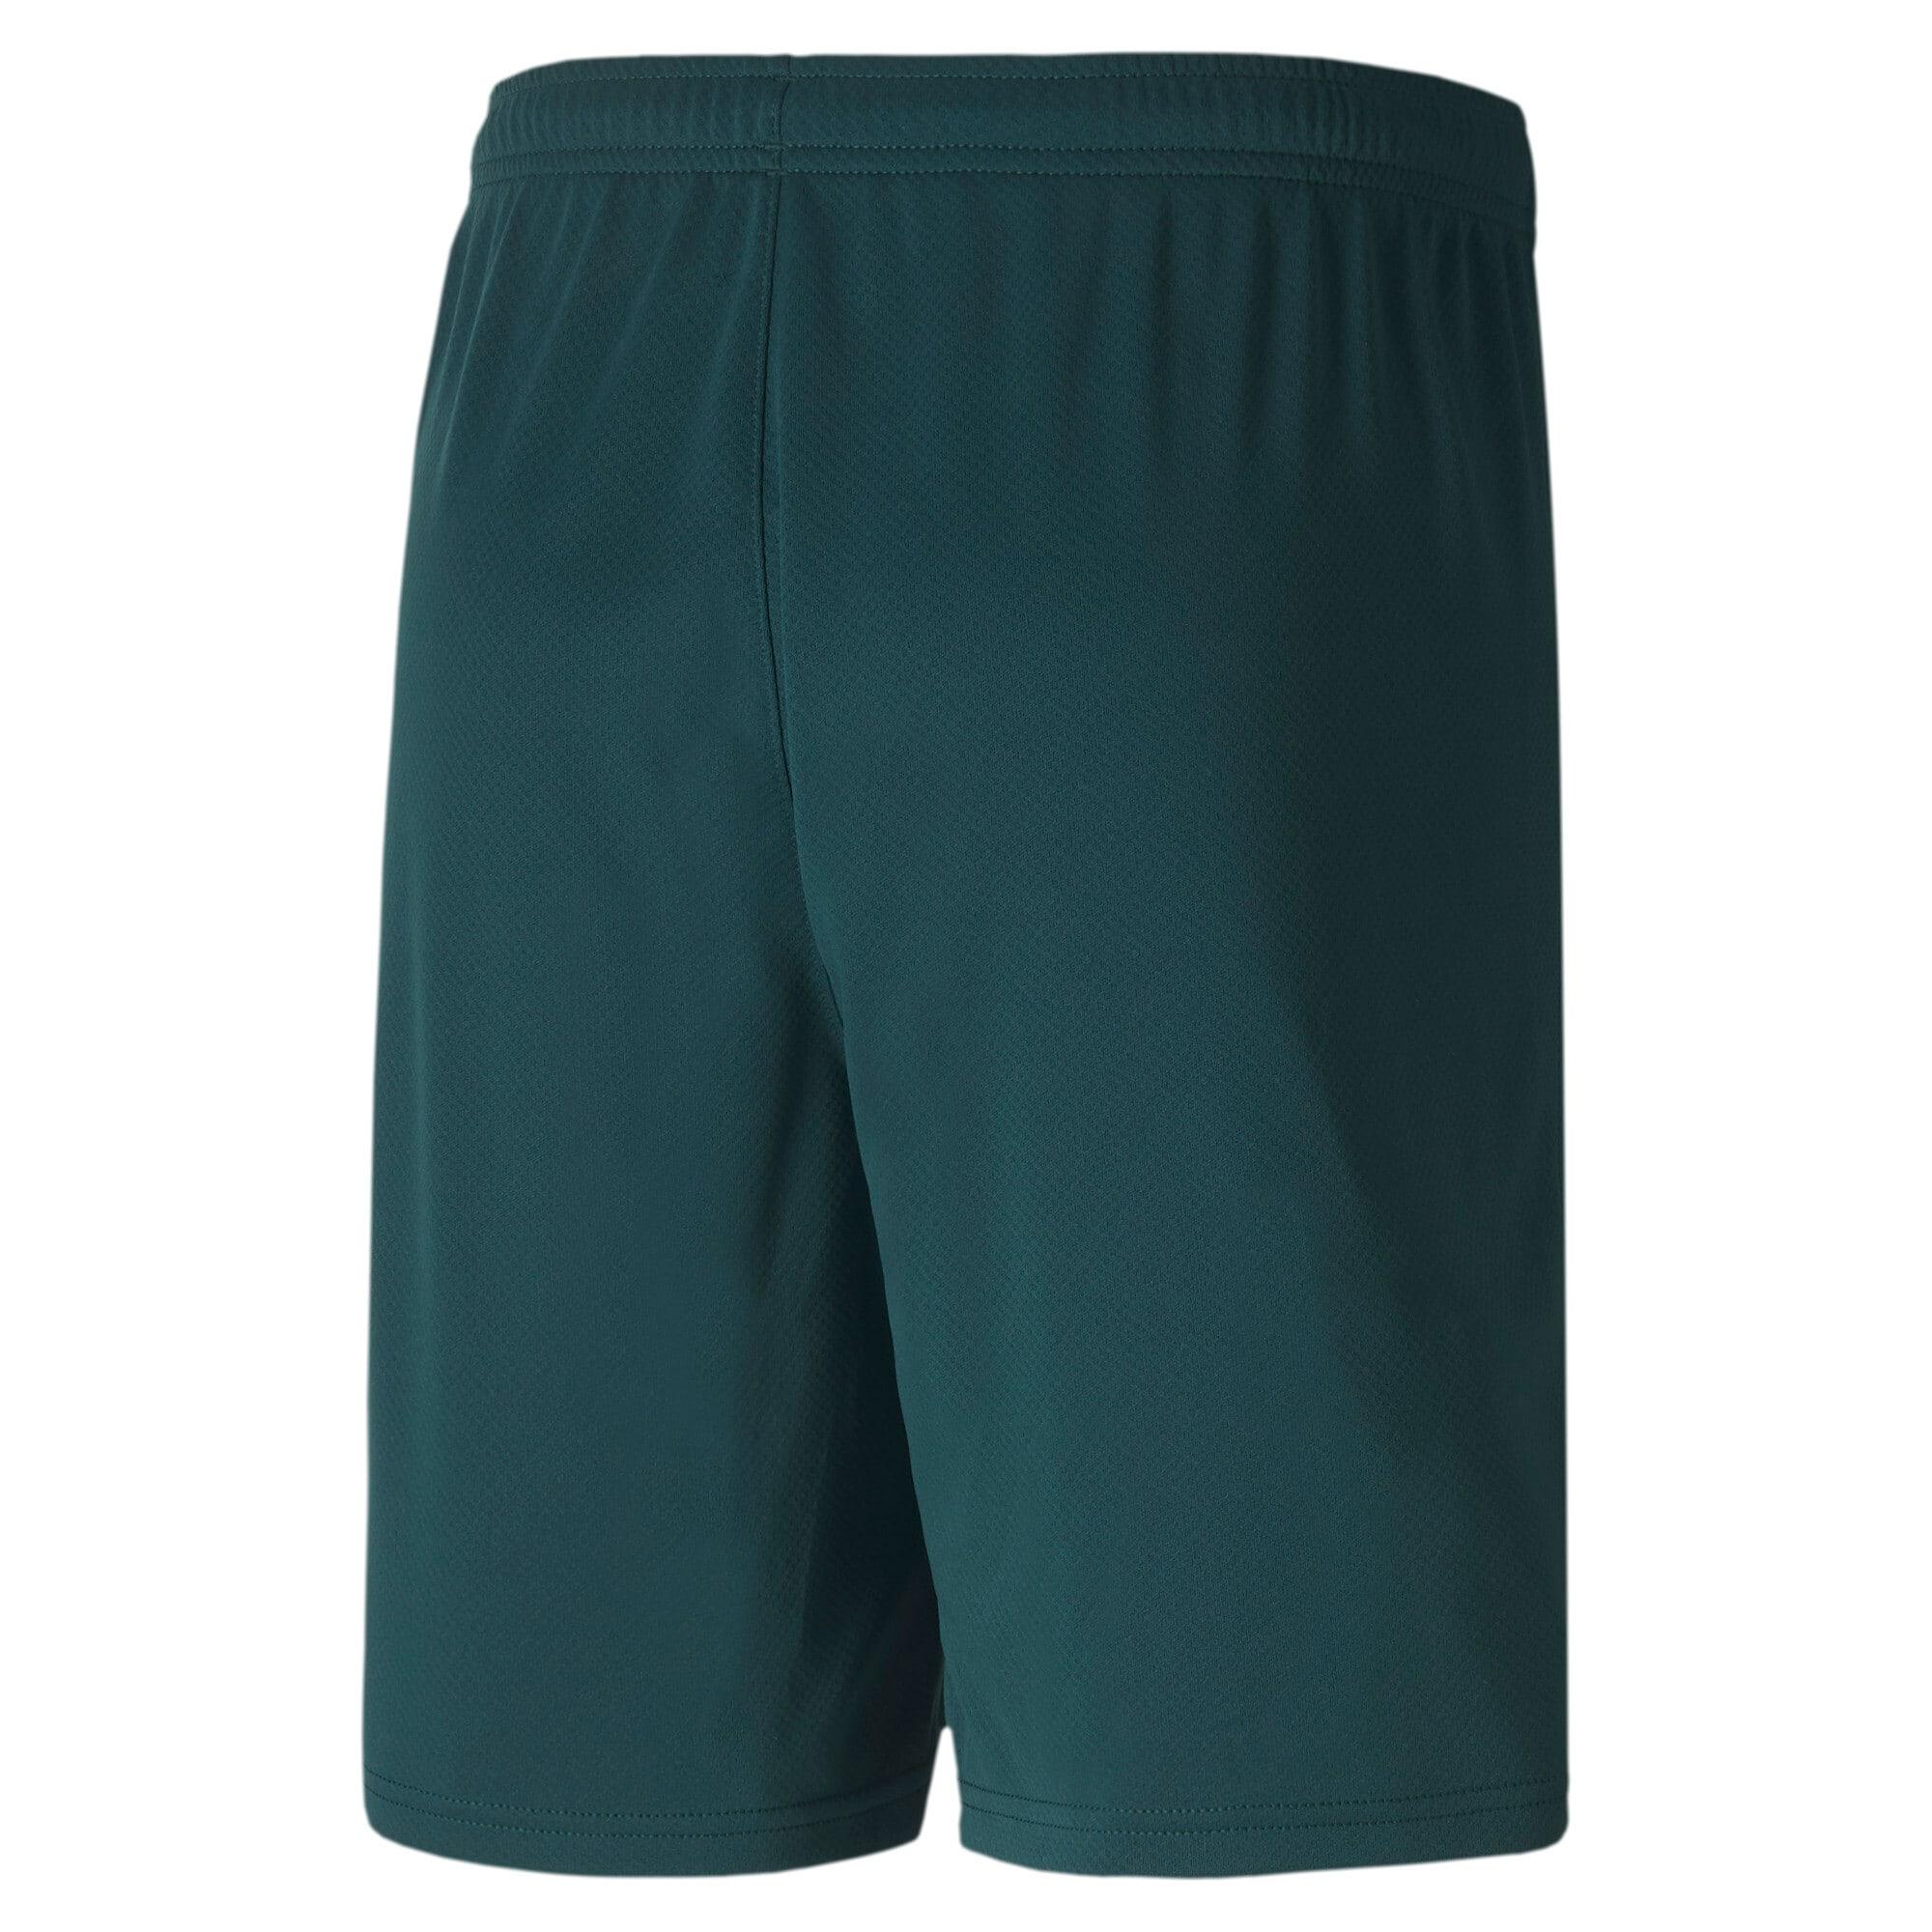 Thumbnail 2 of FIGC Men's Third Replica Shorts, Ponderosa Pine-Peacoat, medium